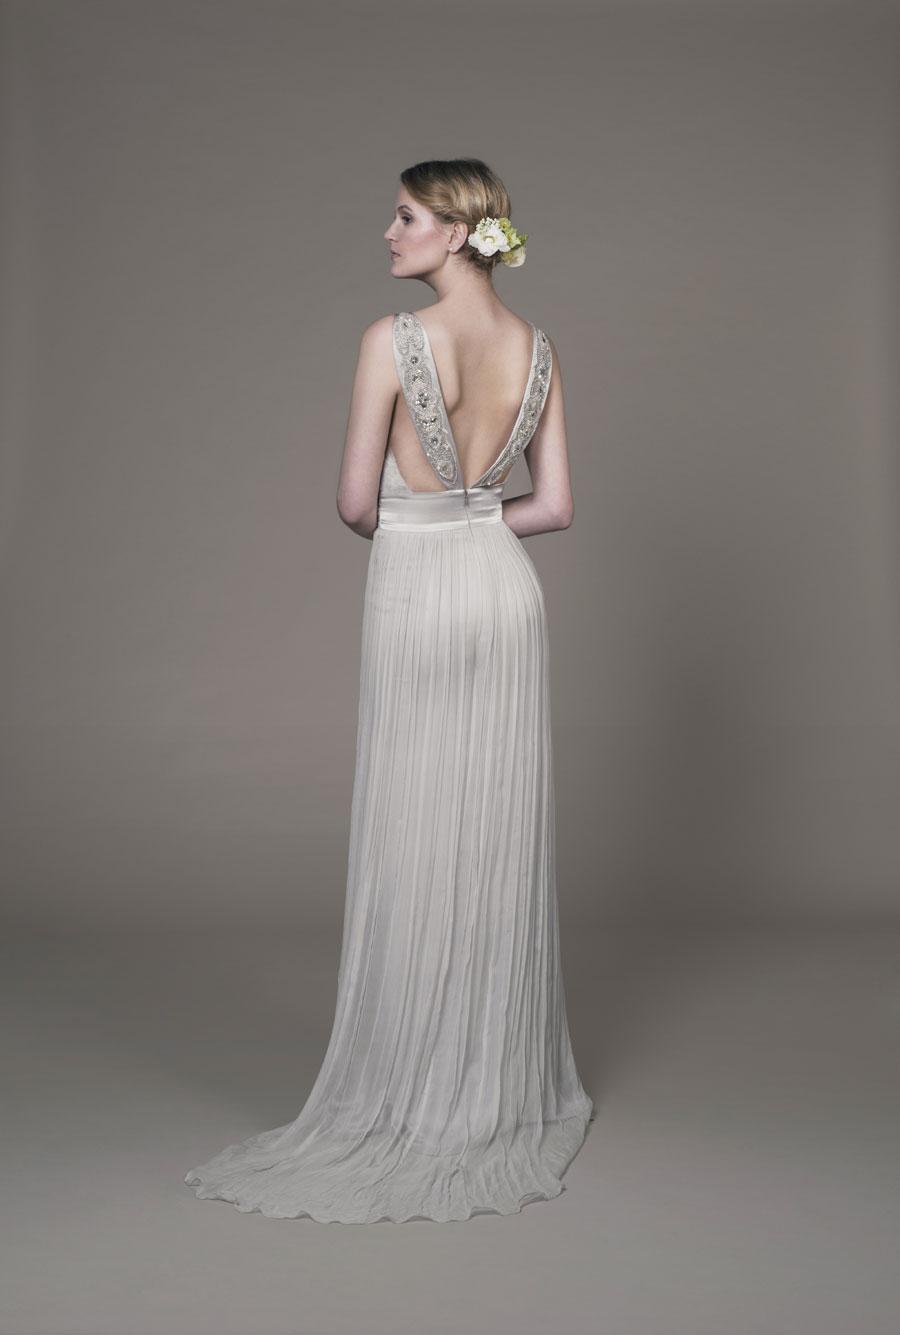 Sanyukta Shrestha: Luxury Wedding Gown Sample Sale! - BridalPulse